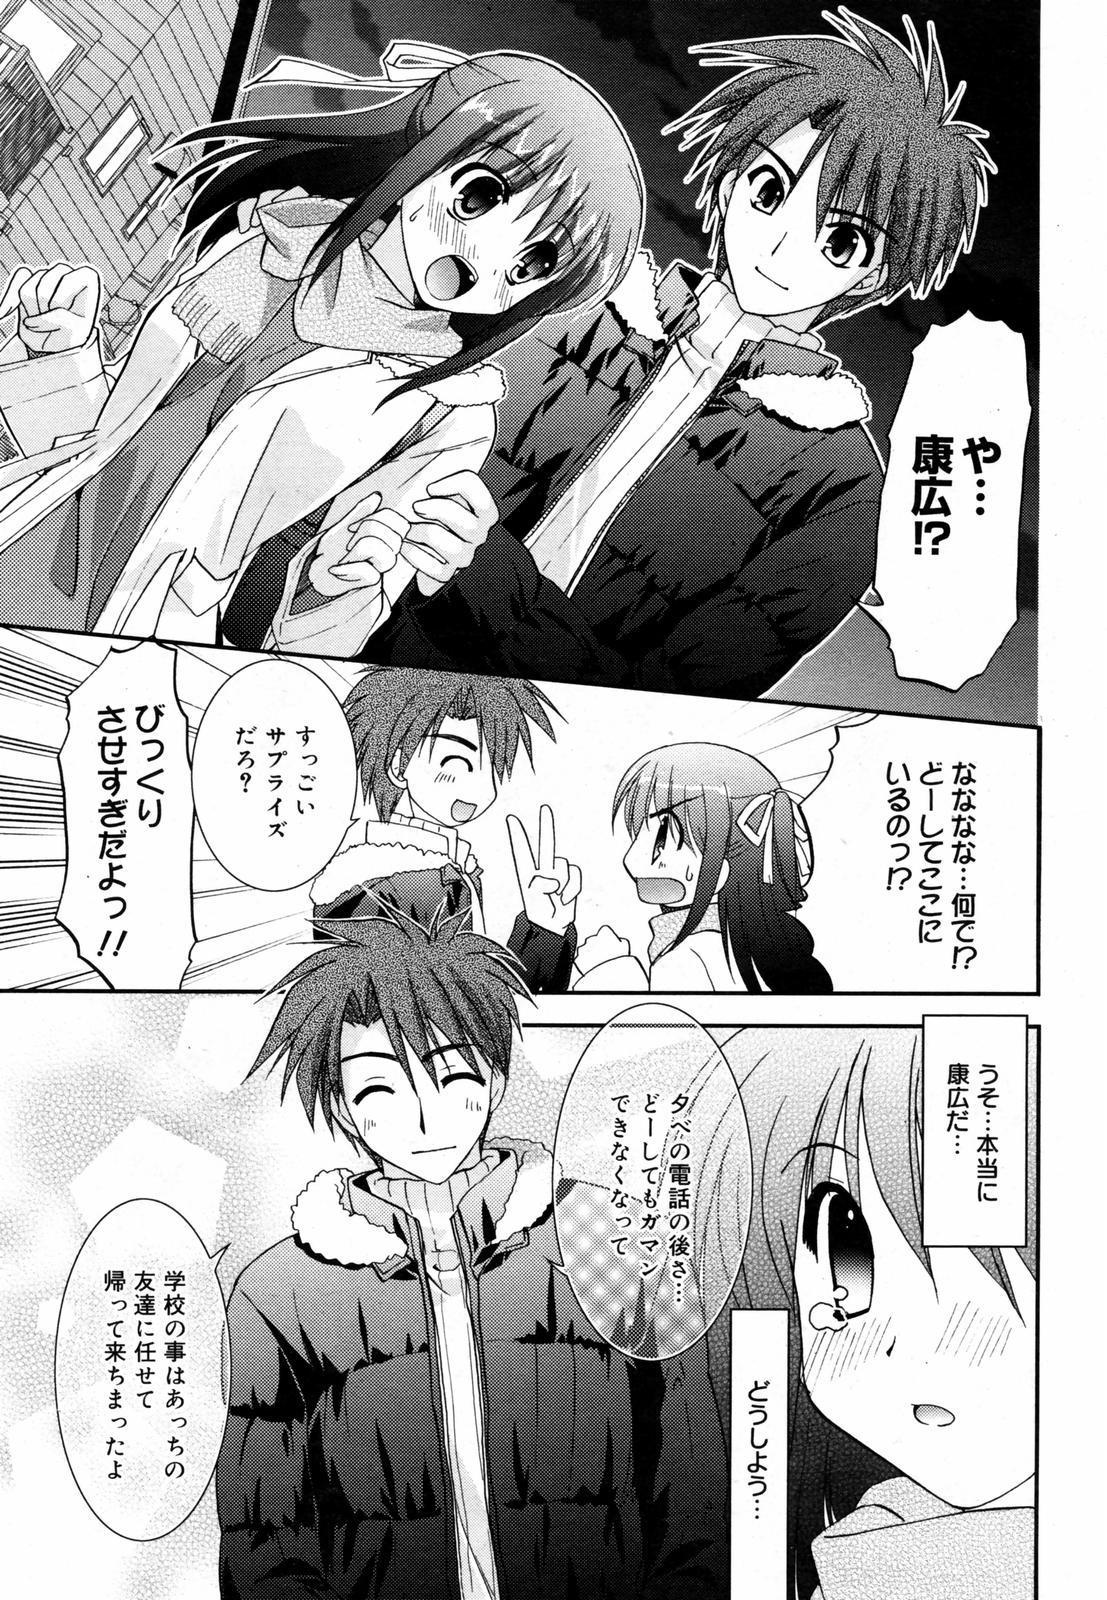 Manga Bangaichi 2008-03 12